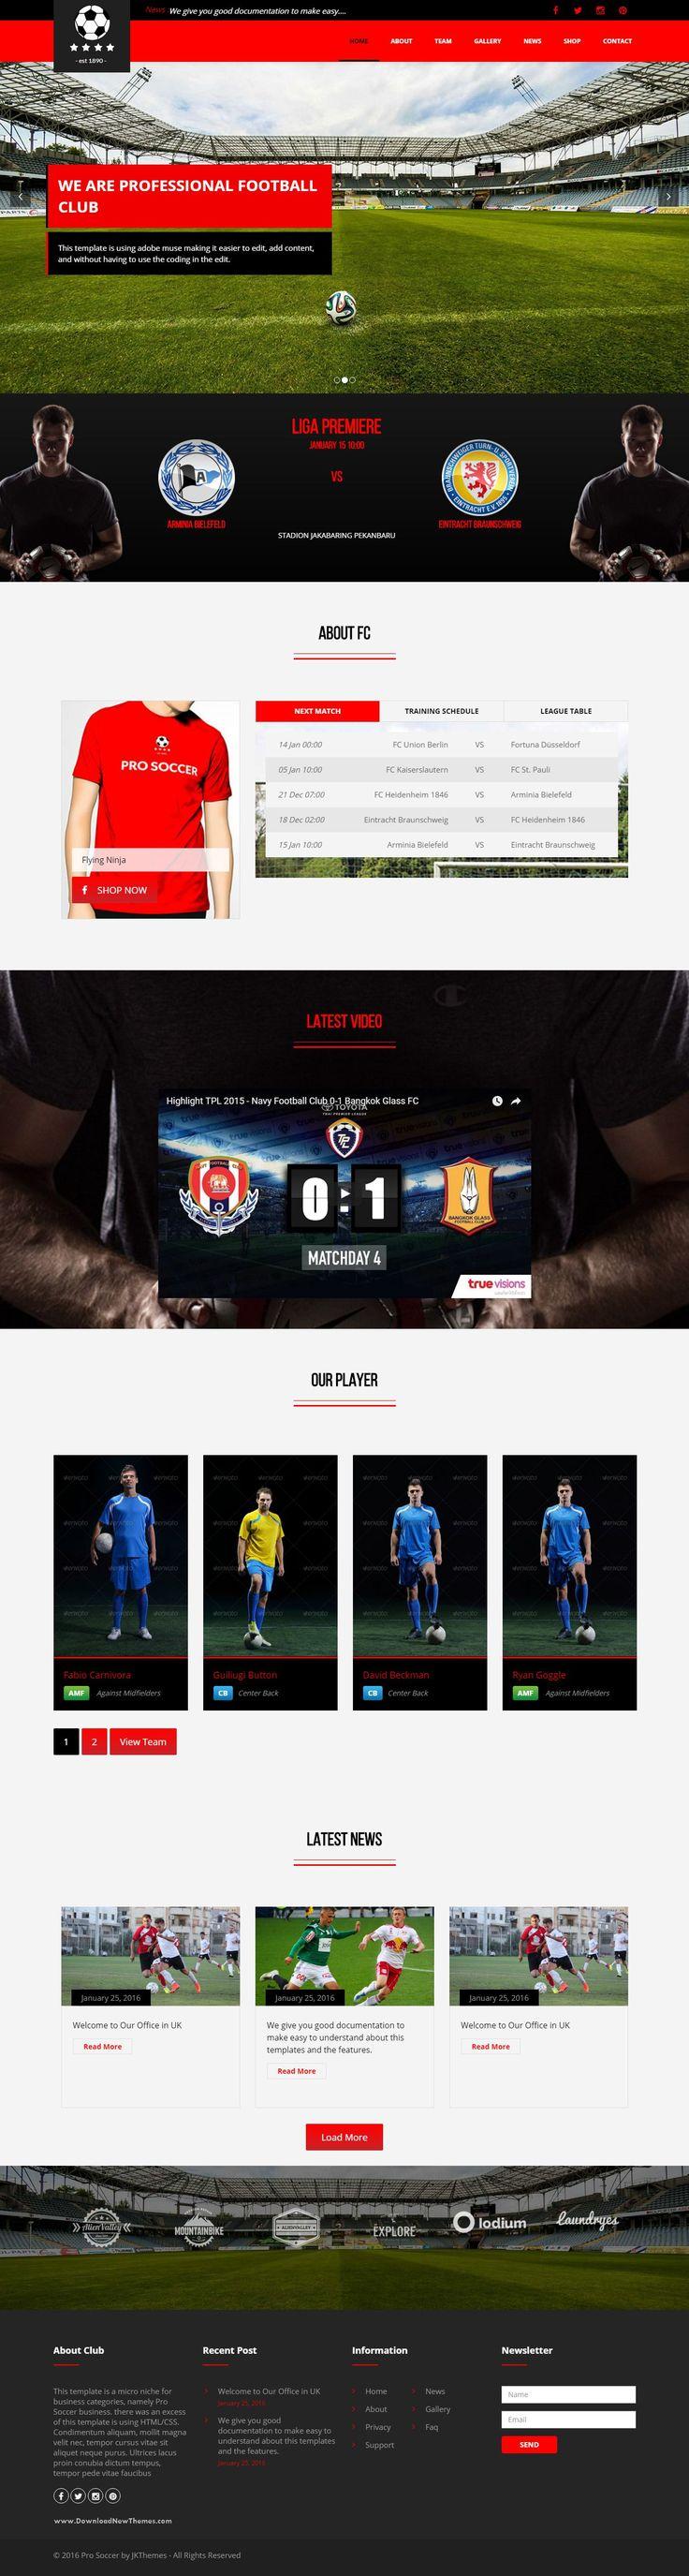 Pro Soccer Best Football Club WordPress Theme Download #soccer #sports #website